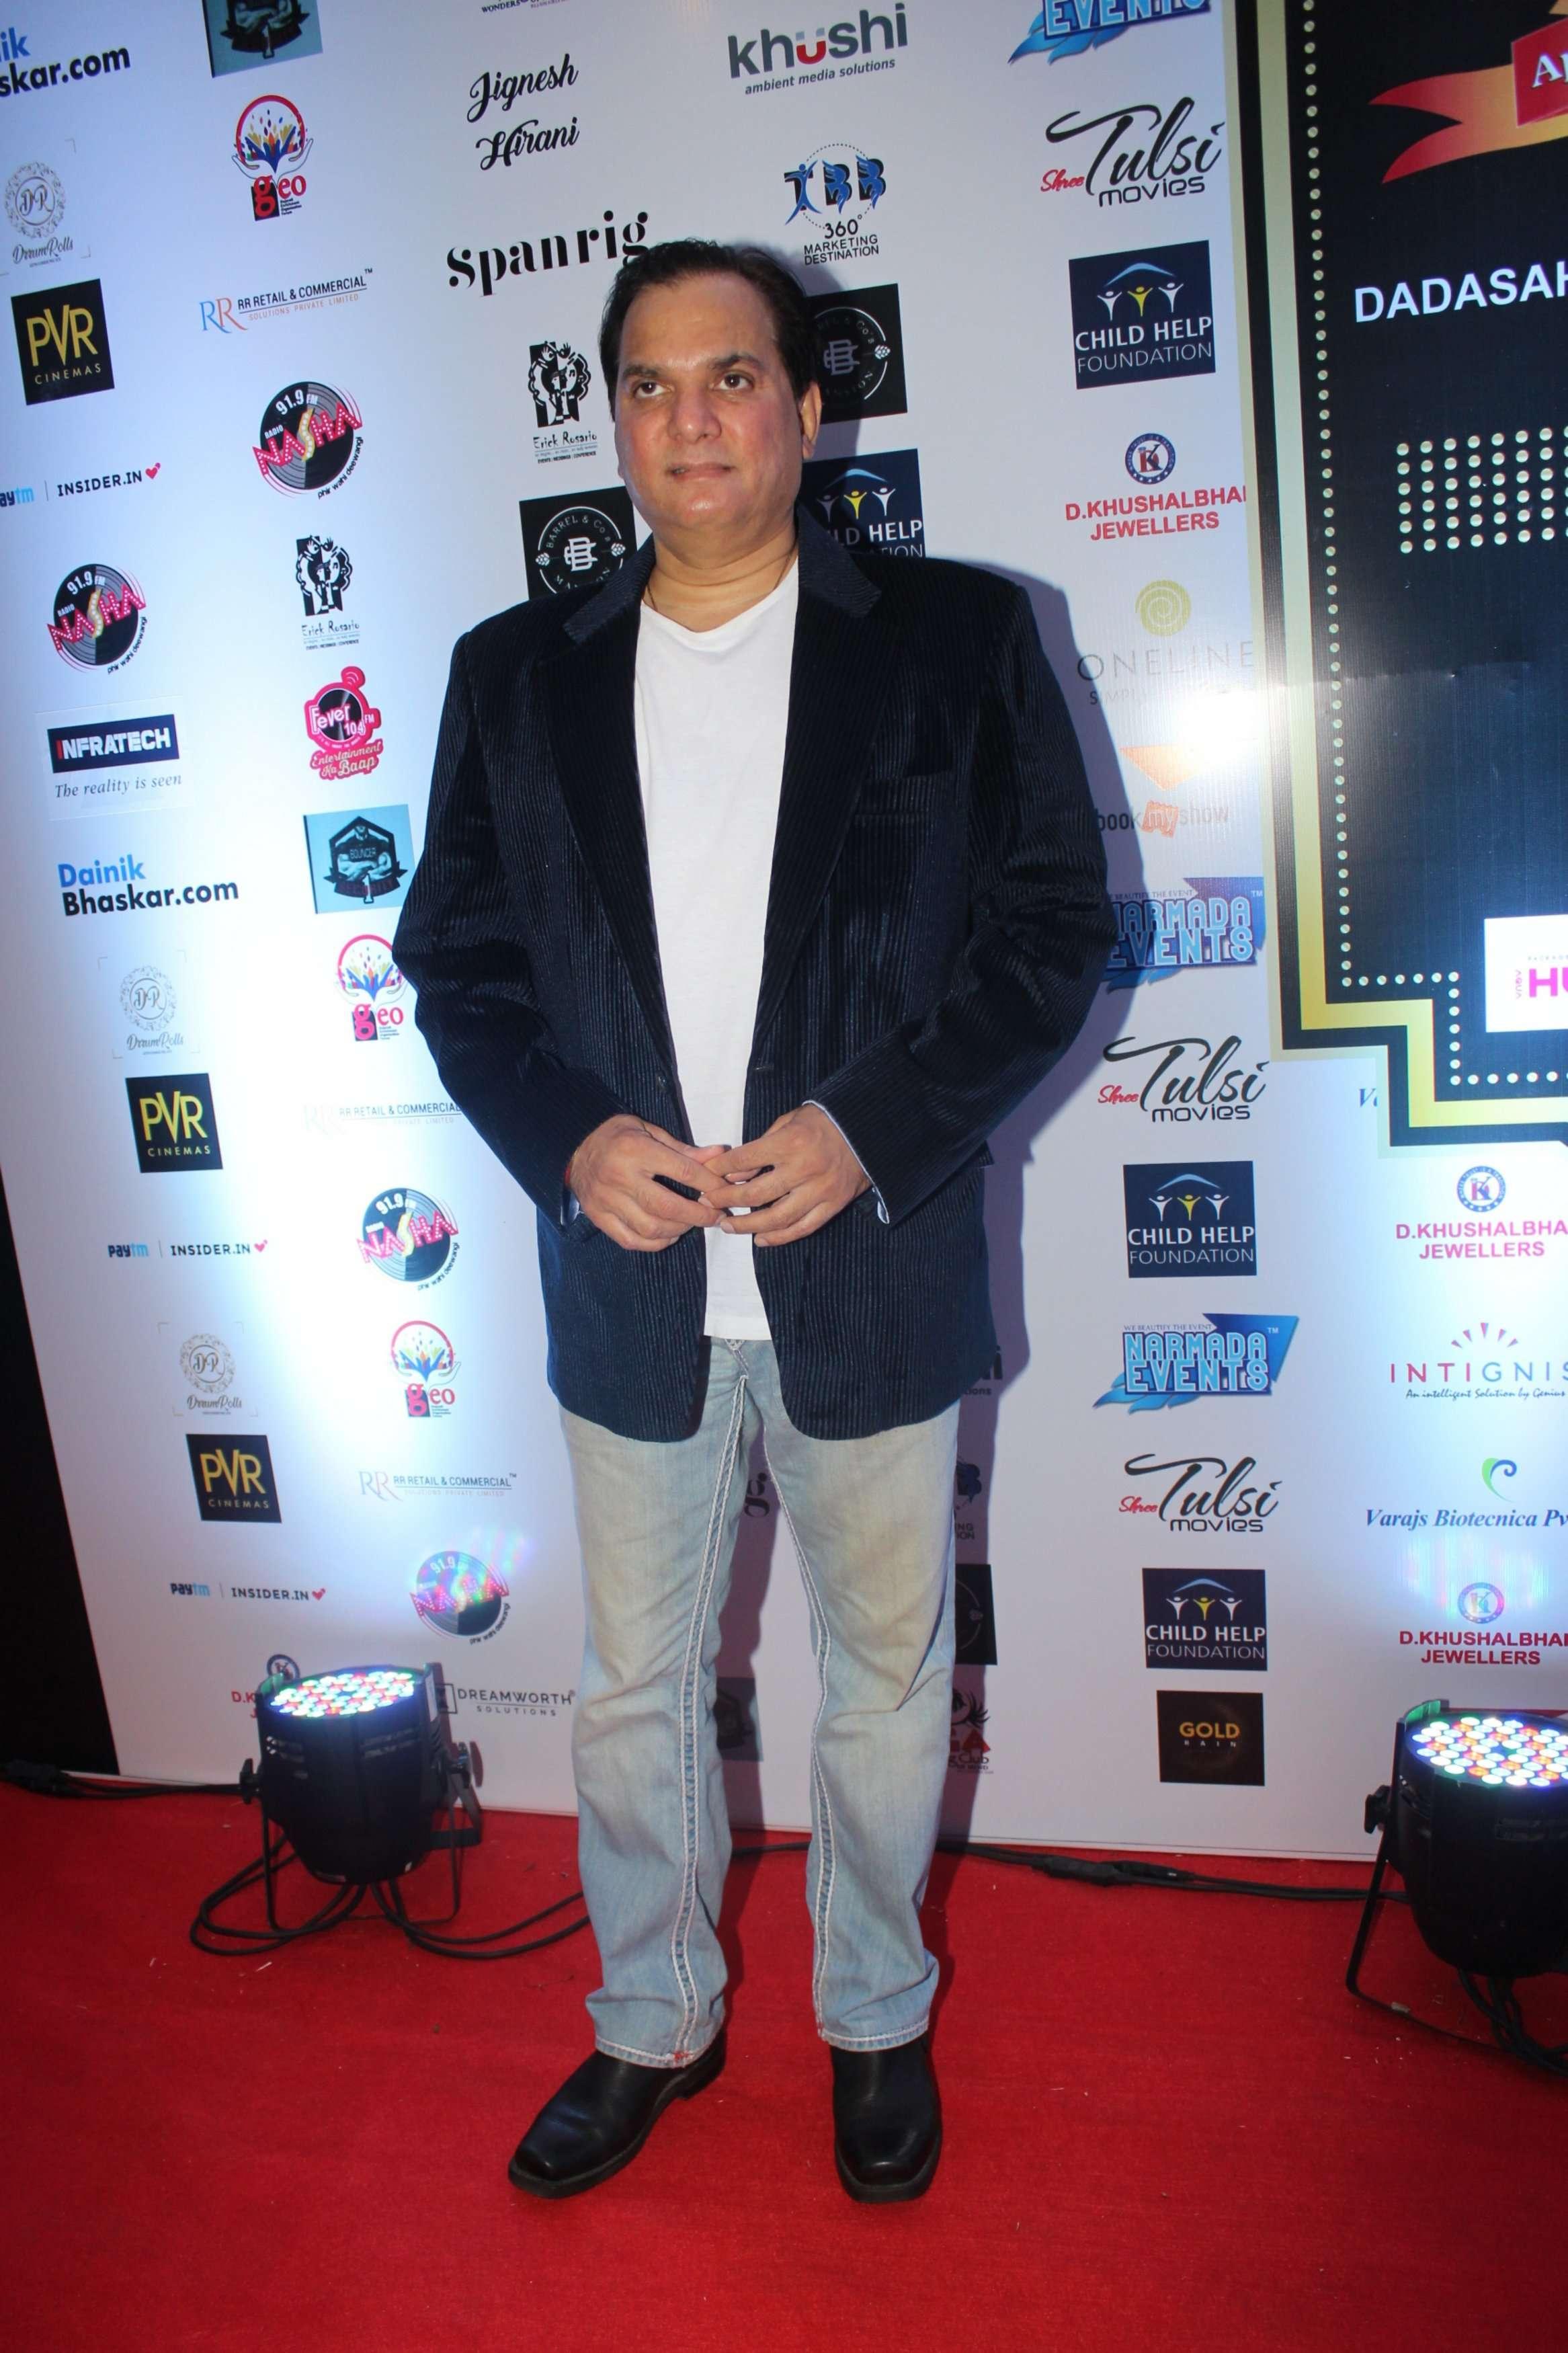 Dadasaheb Phalke International Film Festival Awards 2019 (3)